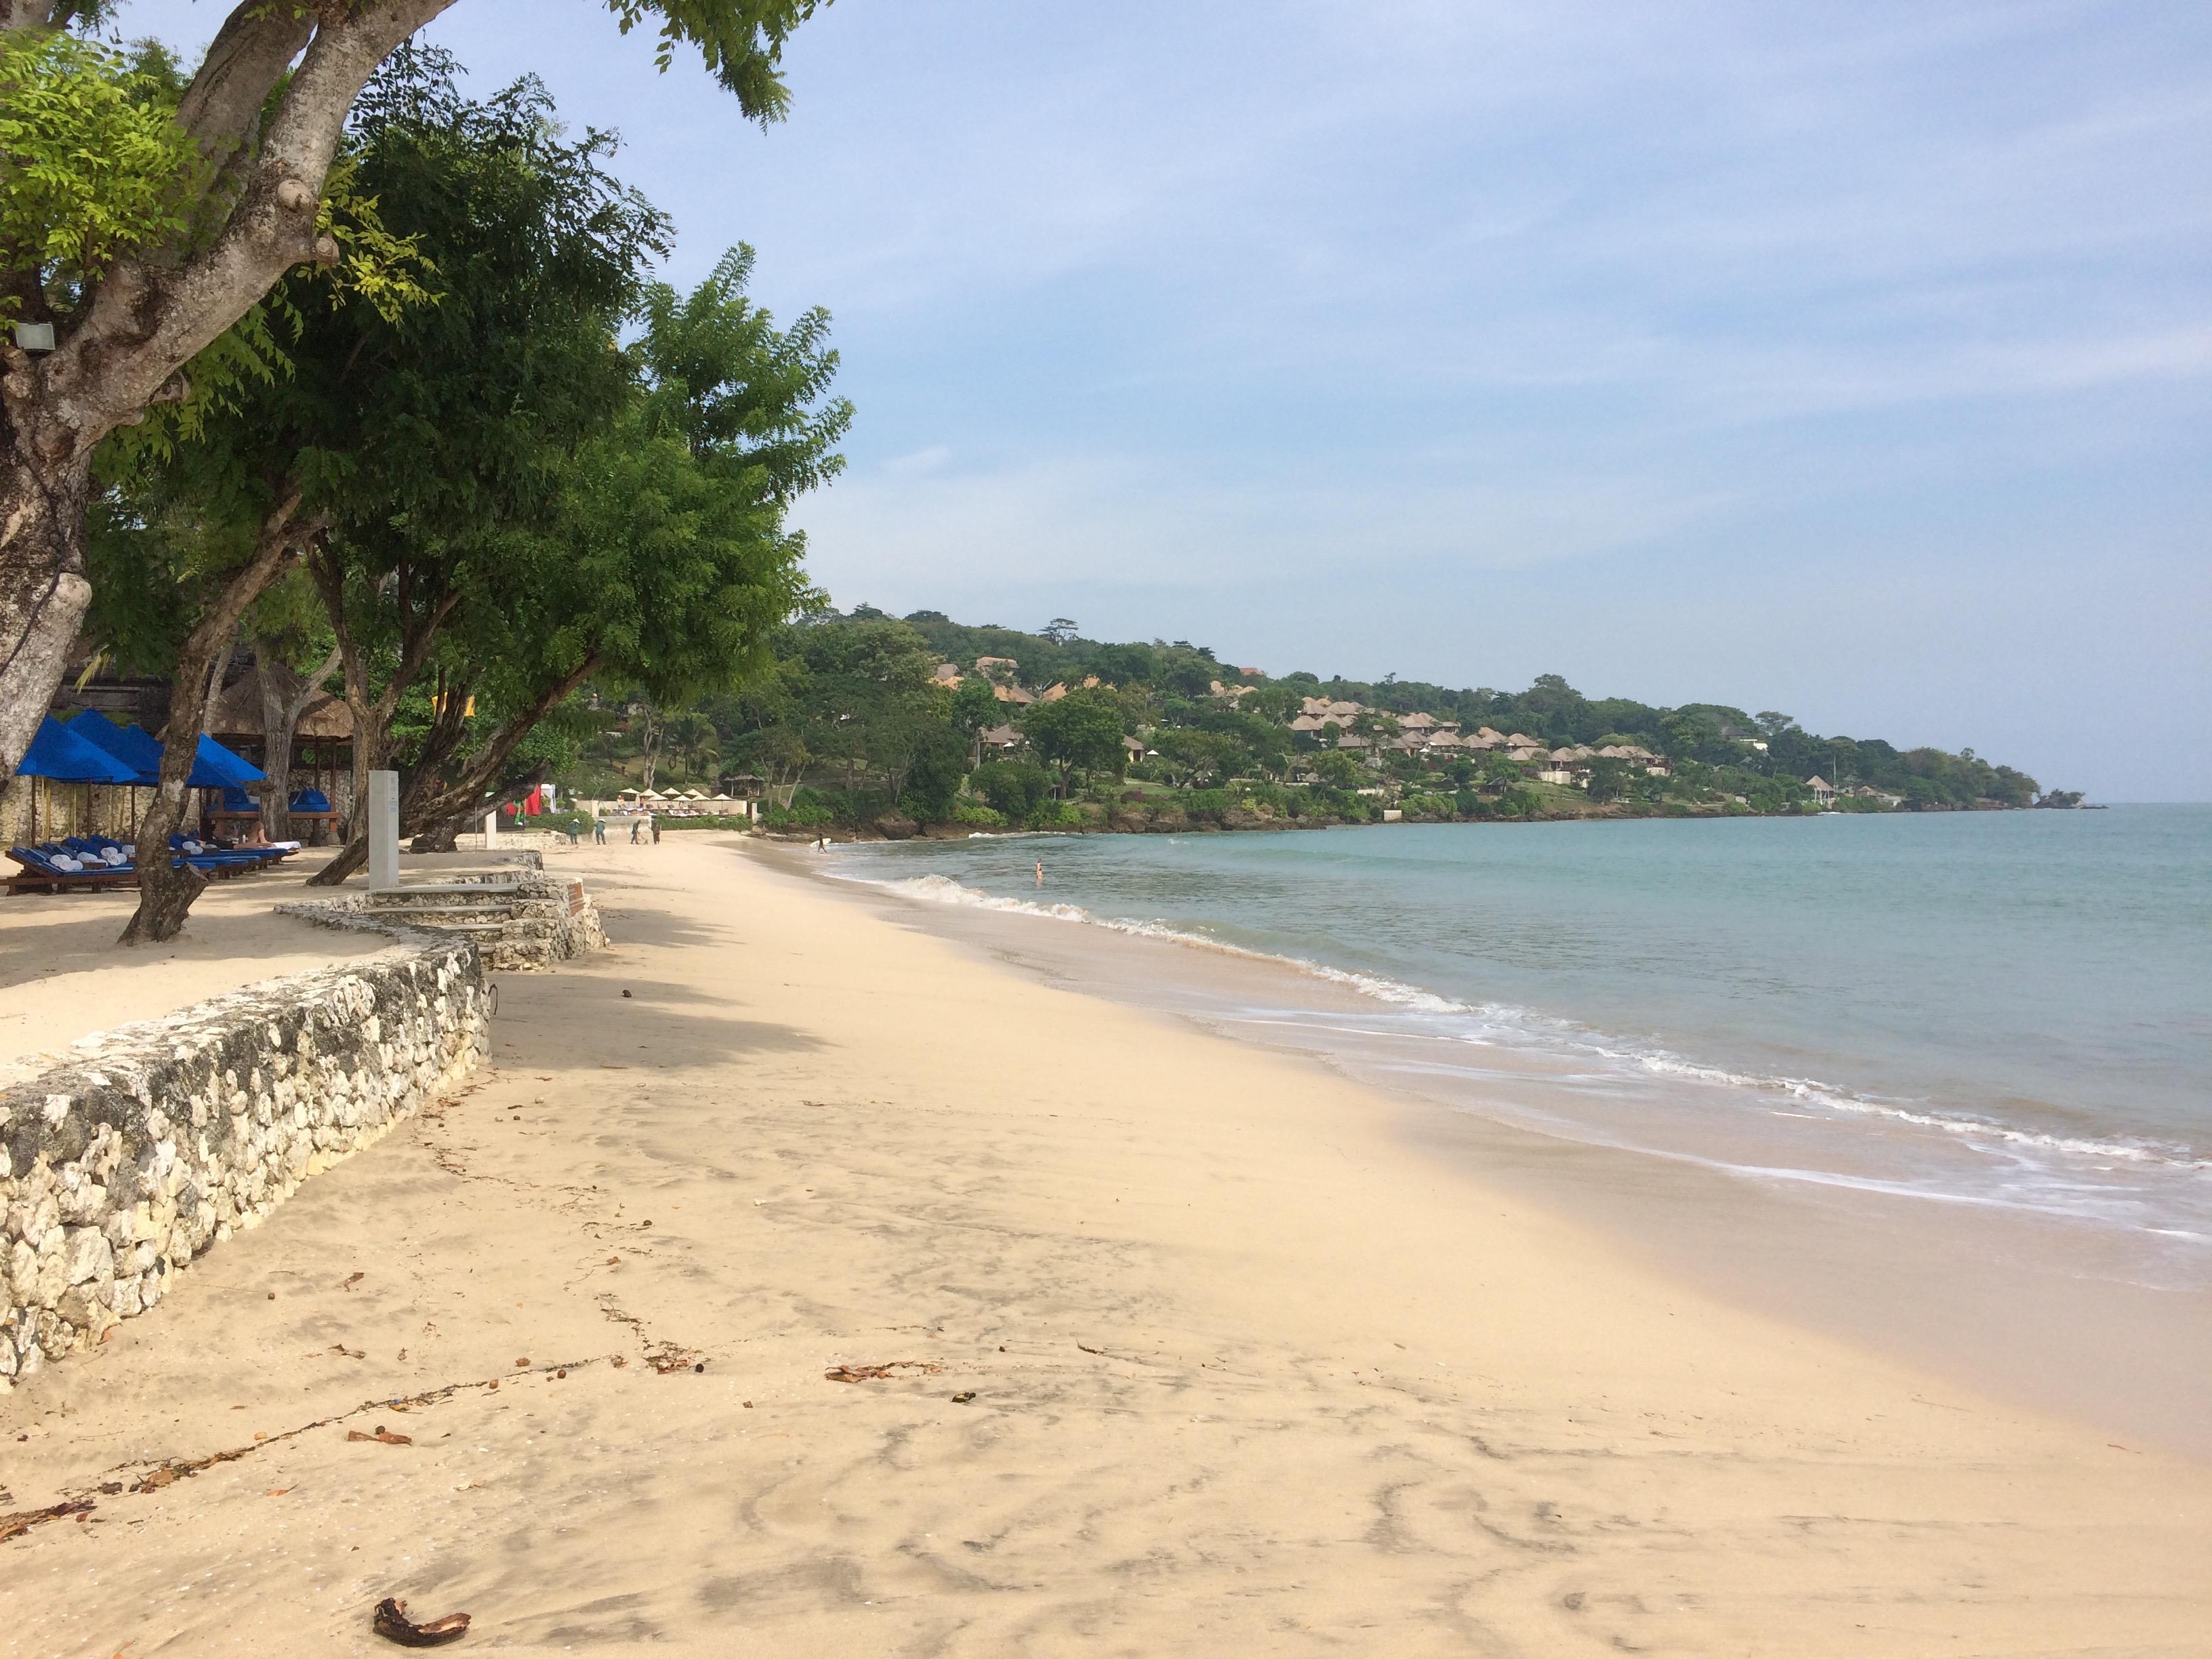 Am Strand von Jimbaran